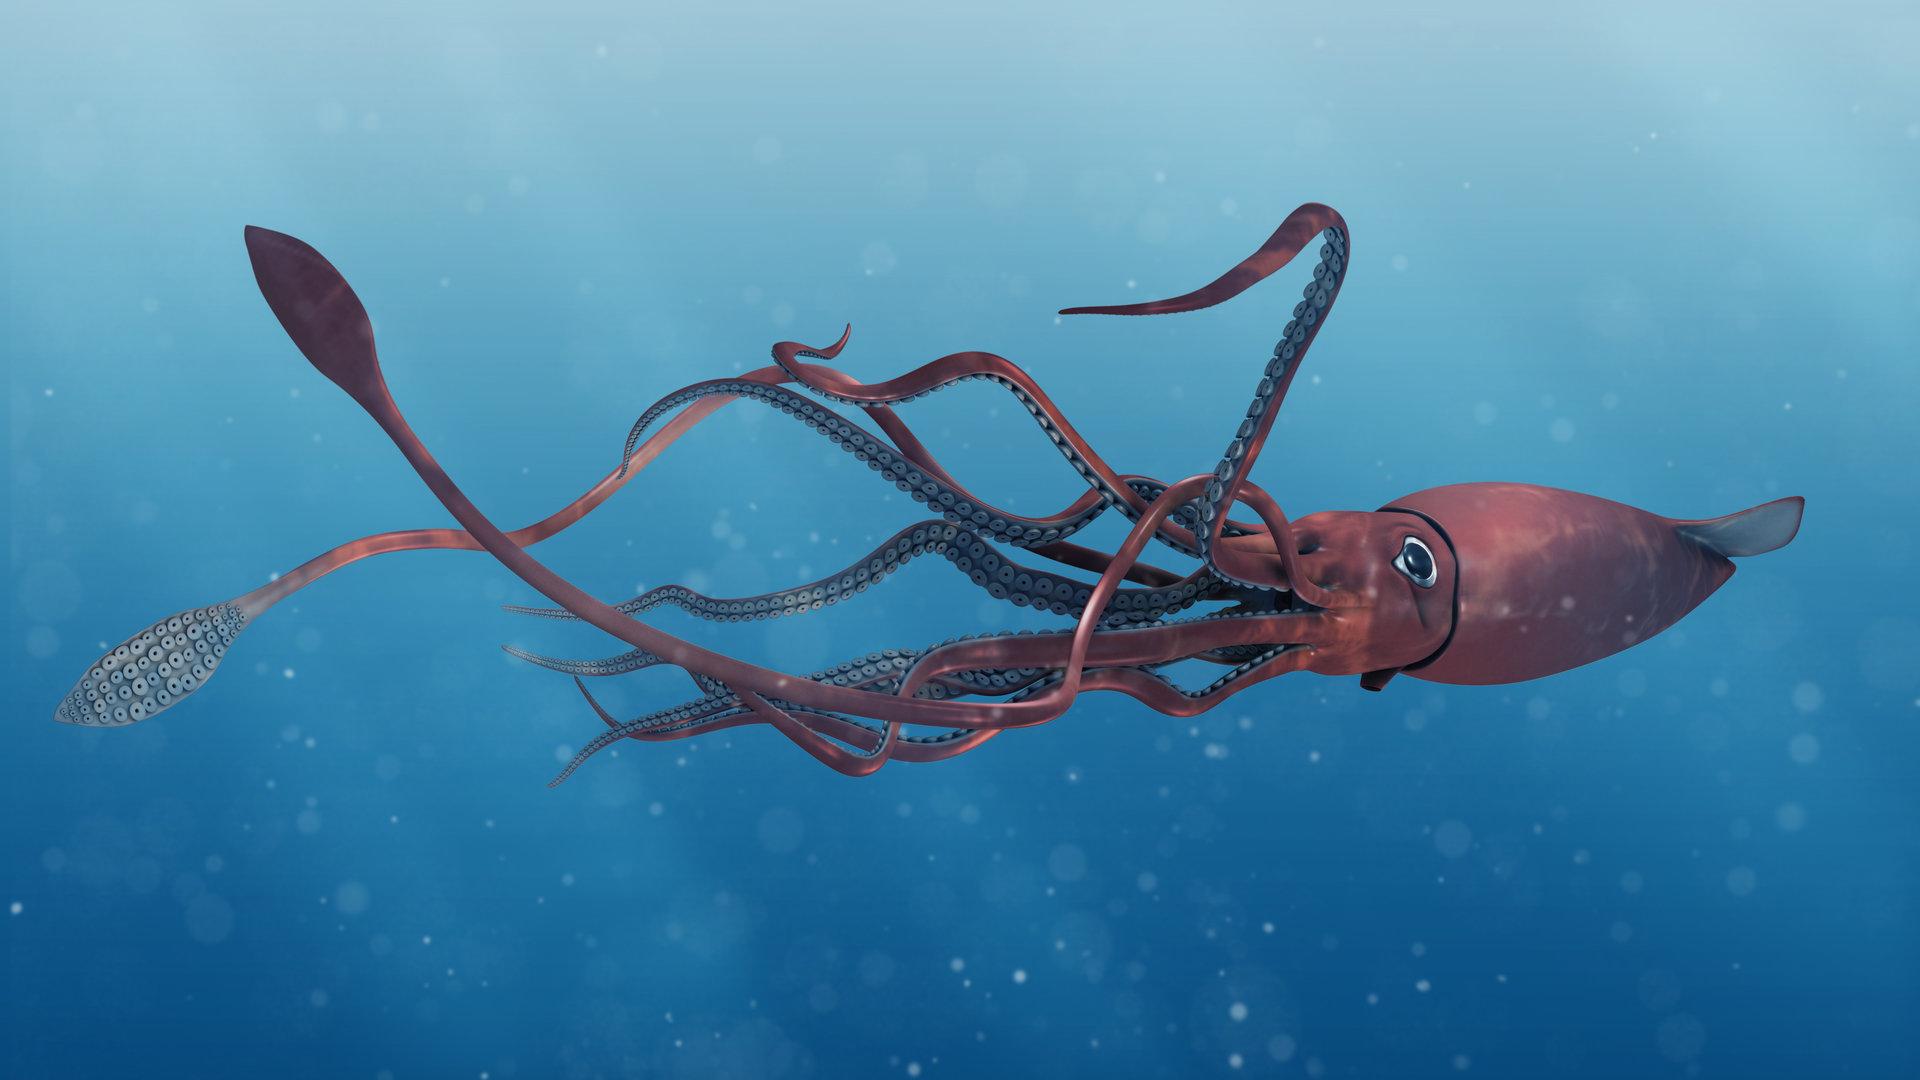 Calamaro gigante avvistato nelle acque territoriali USA thumbnail